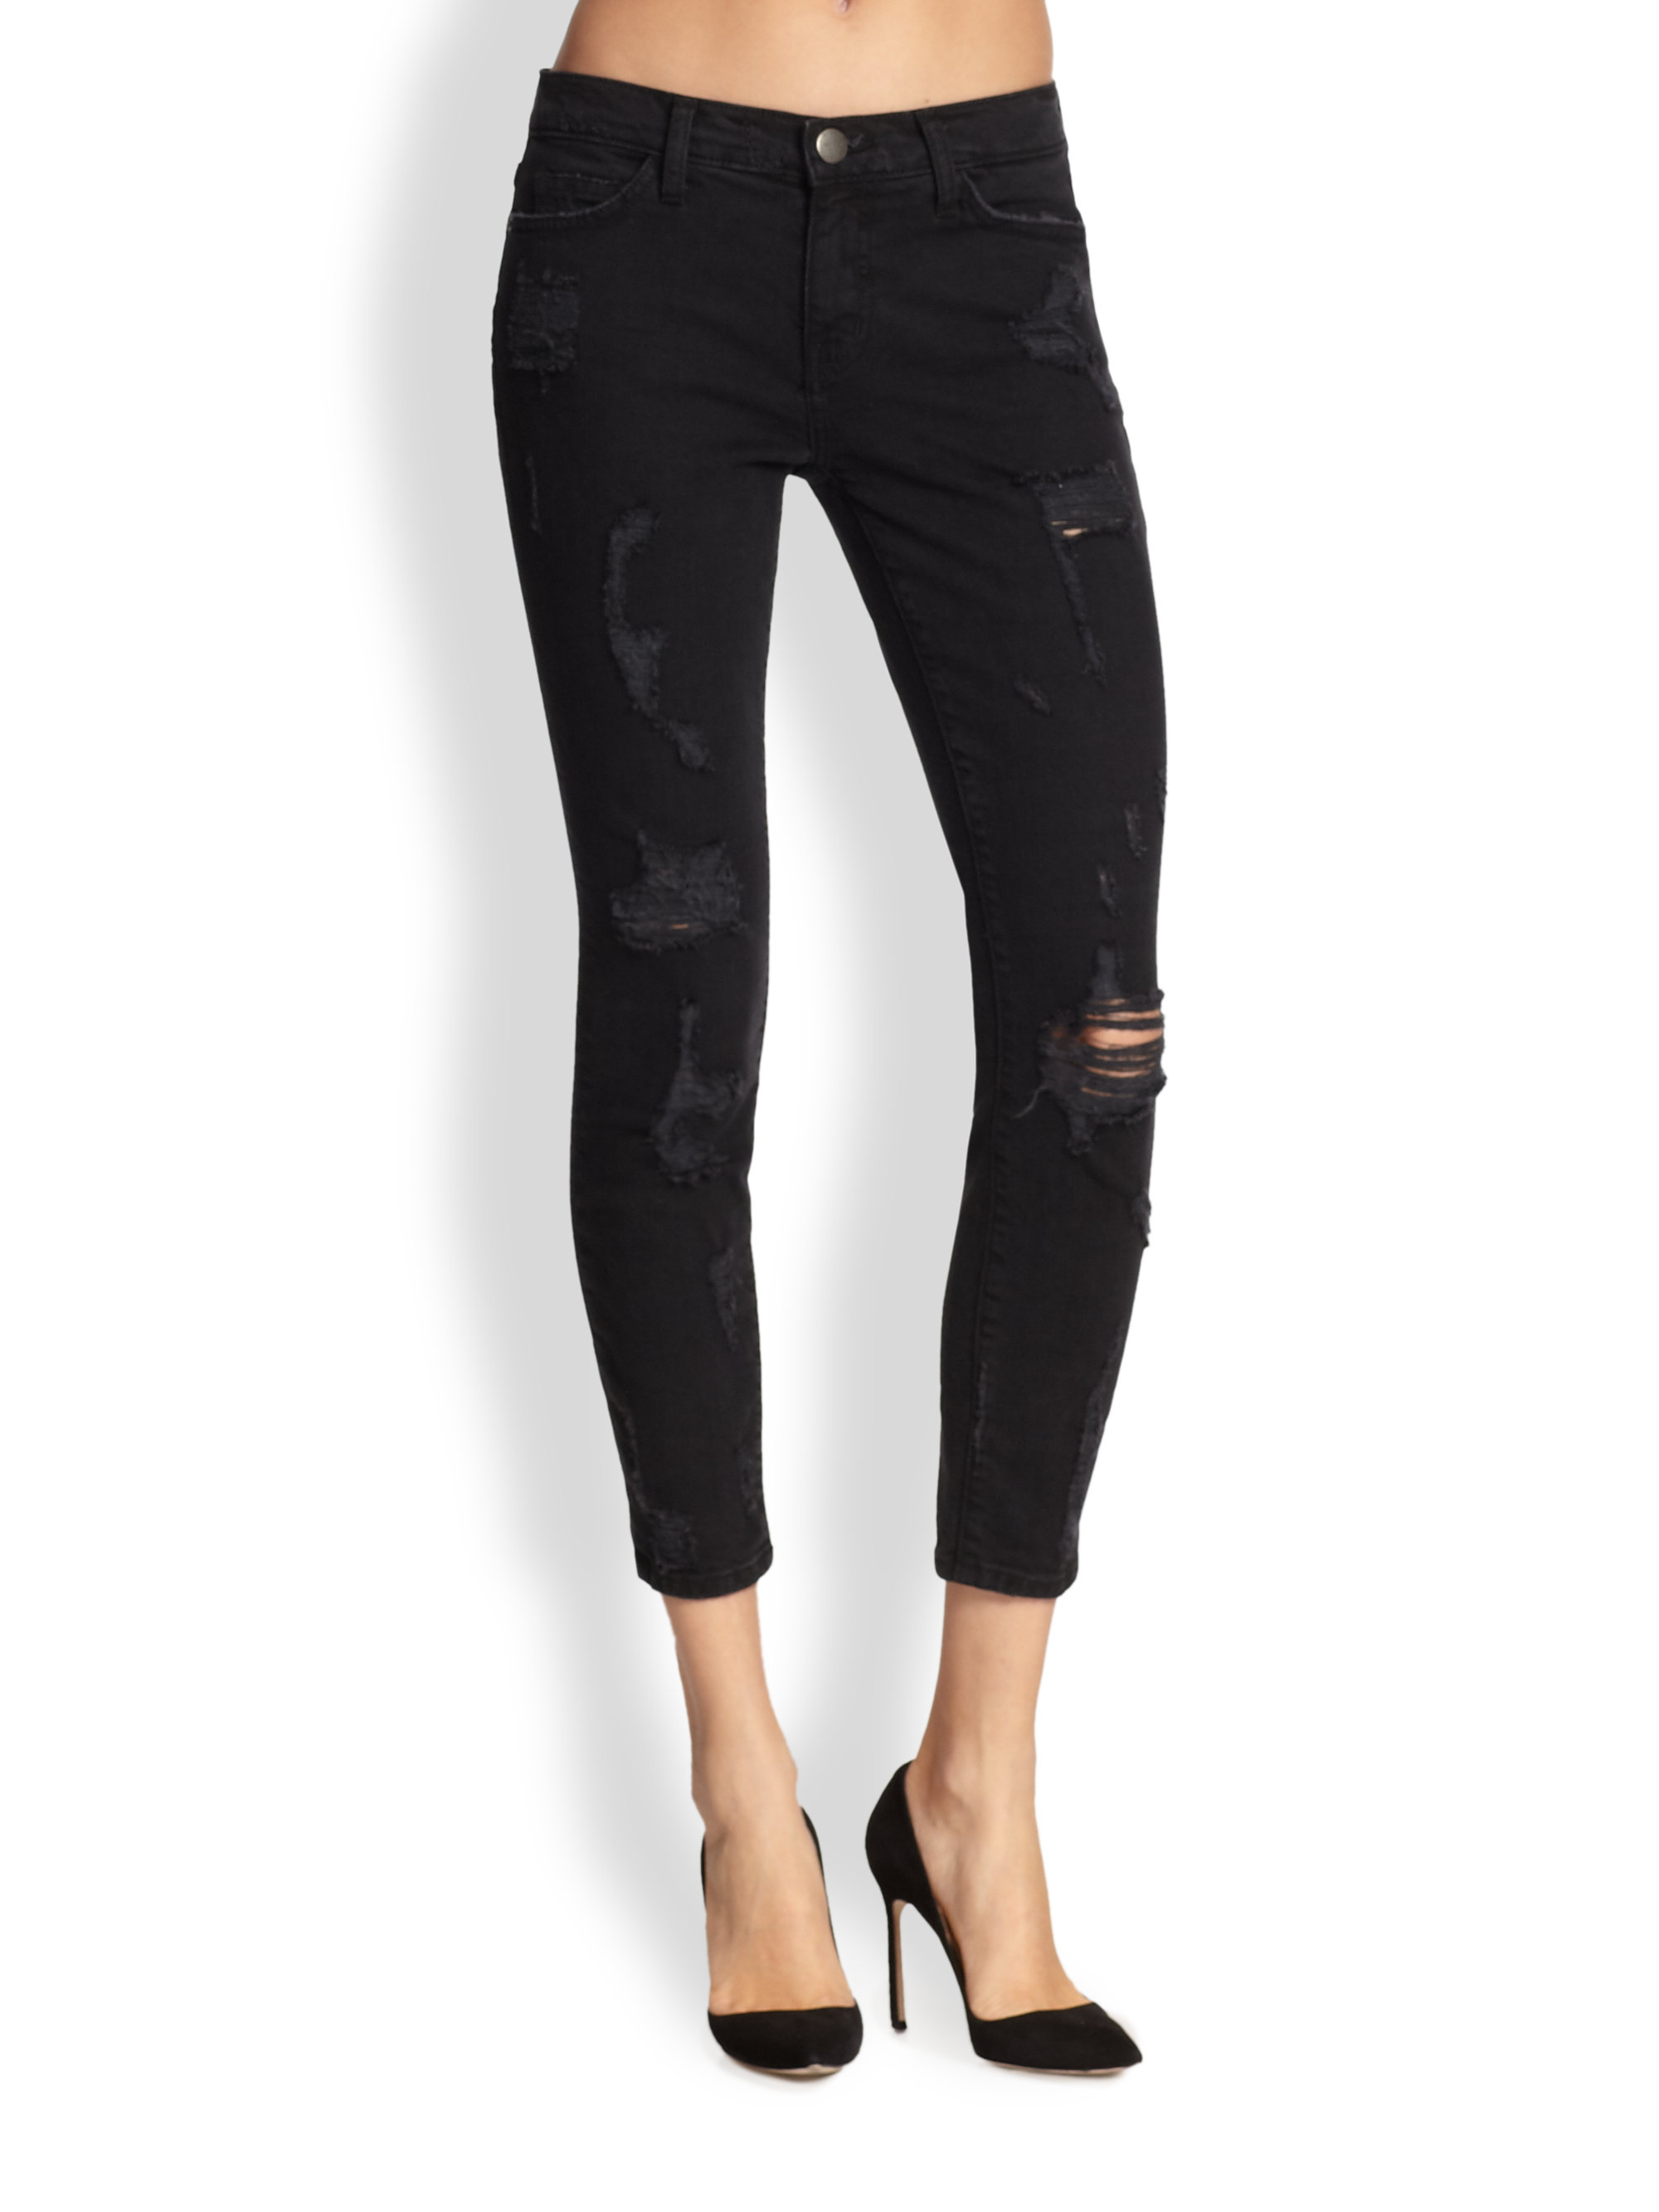 Current/elliott Stiletto Shredded Cropped Skinny Jeans in Black   Lyst